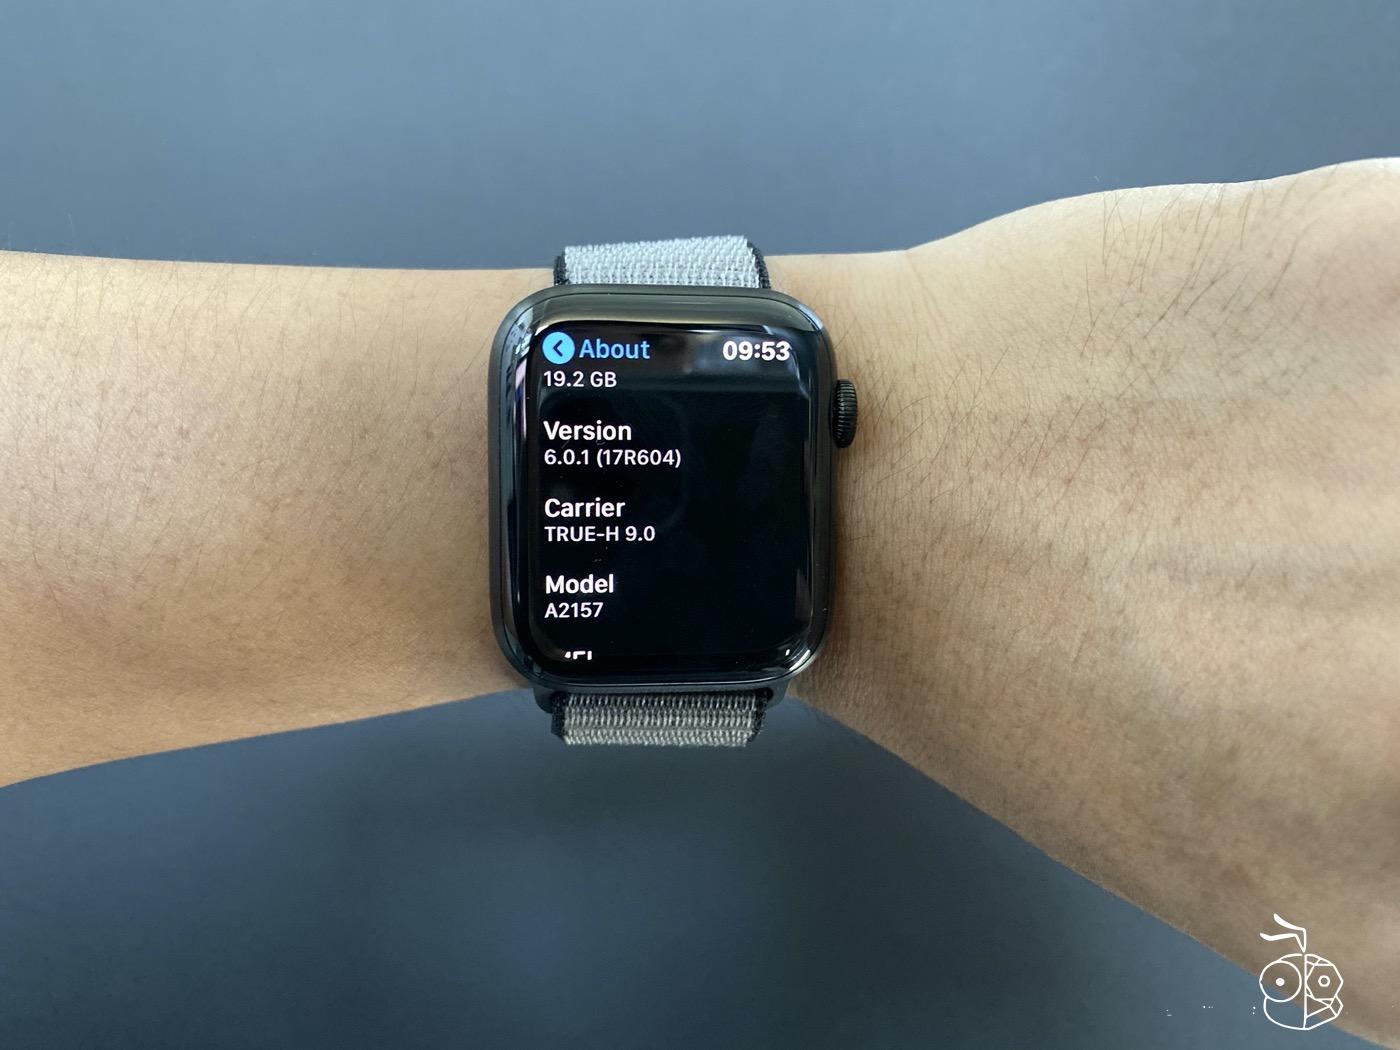 Apple Watch Series 5 Watchos 6.0.1